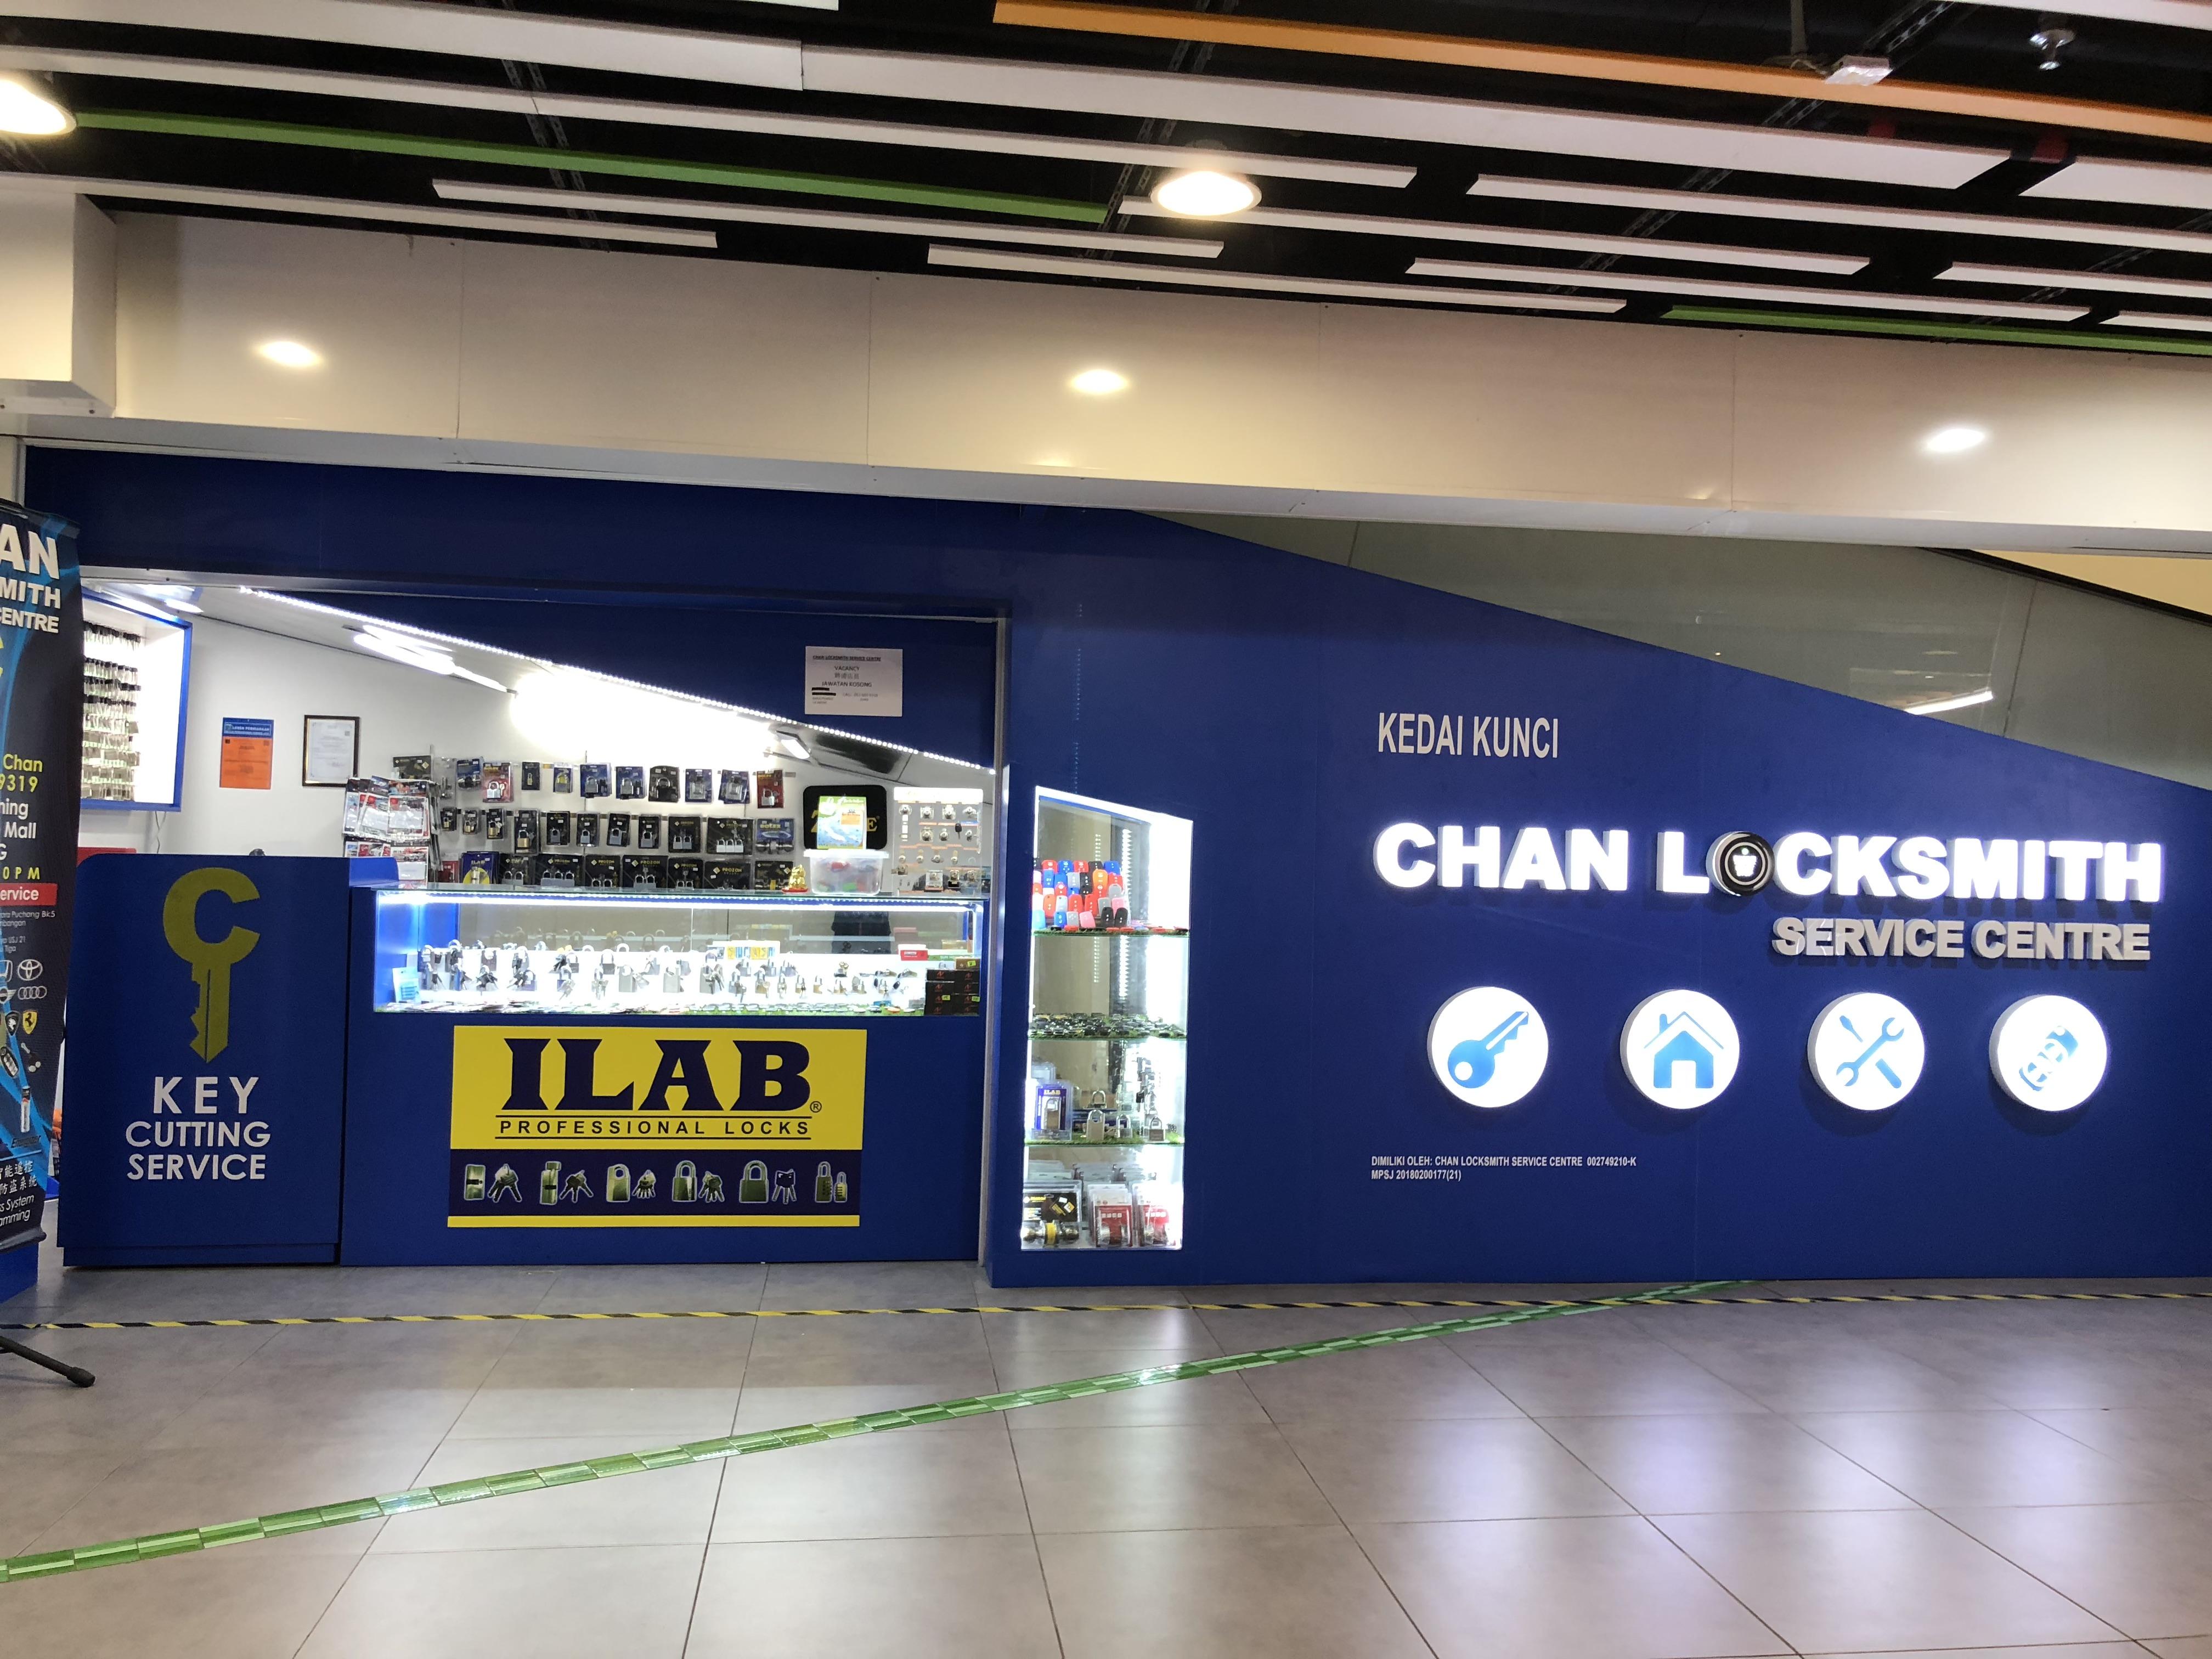 Chan Locksmith Service Centre